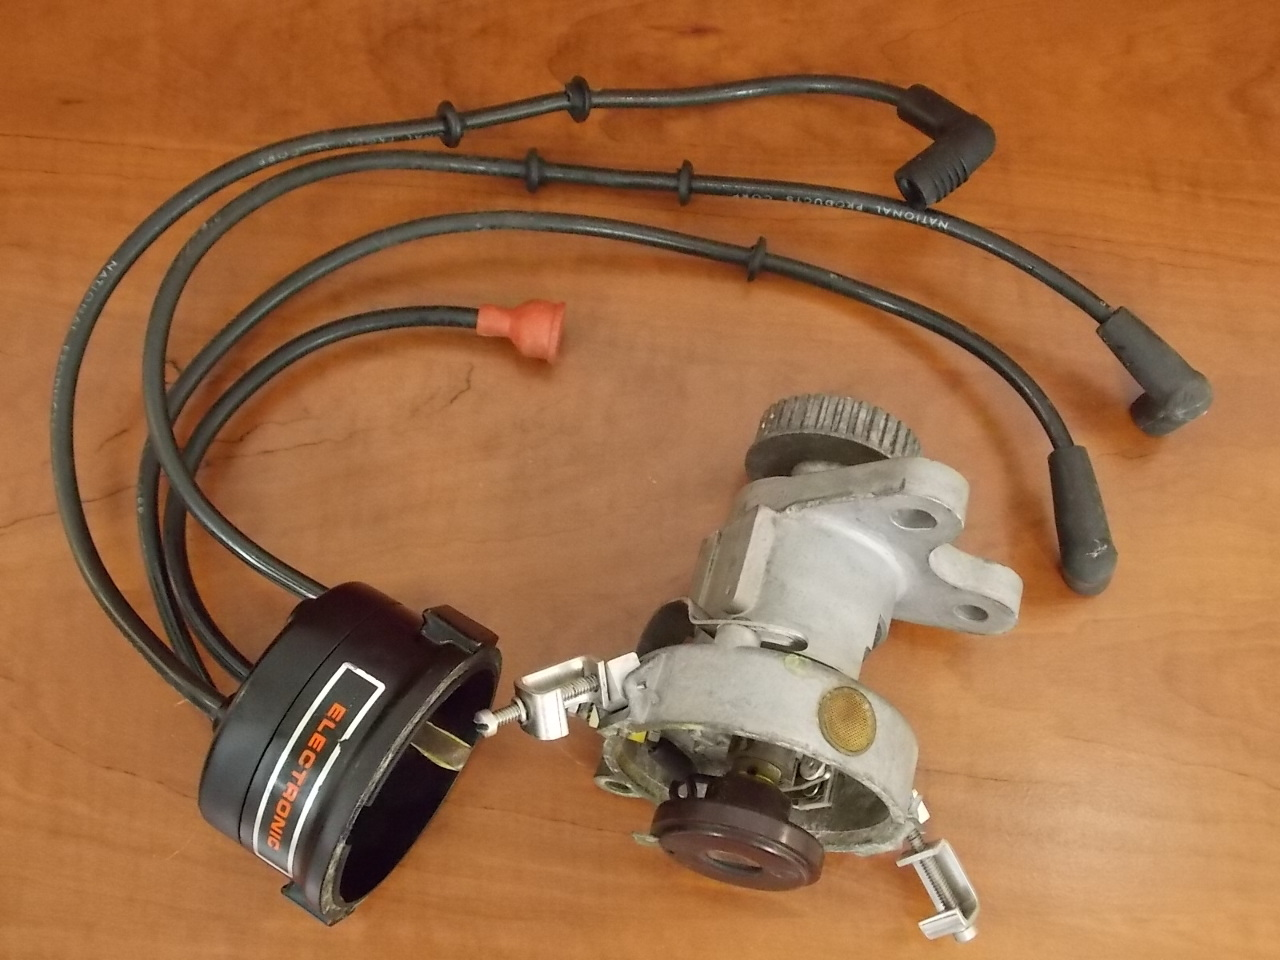 chrysler marine ignition coil wiring diagram 1972 chrysler marine 85 wiring